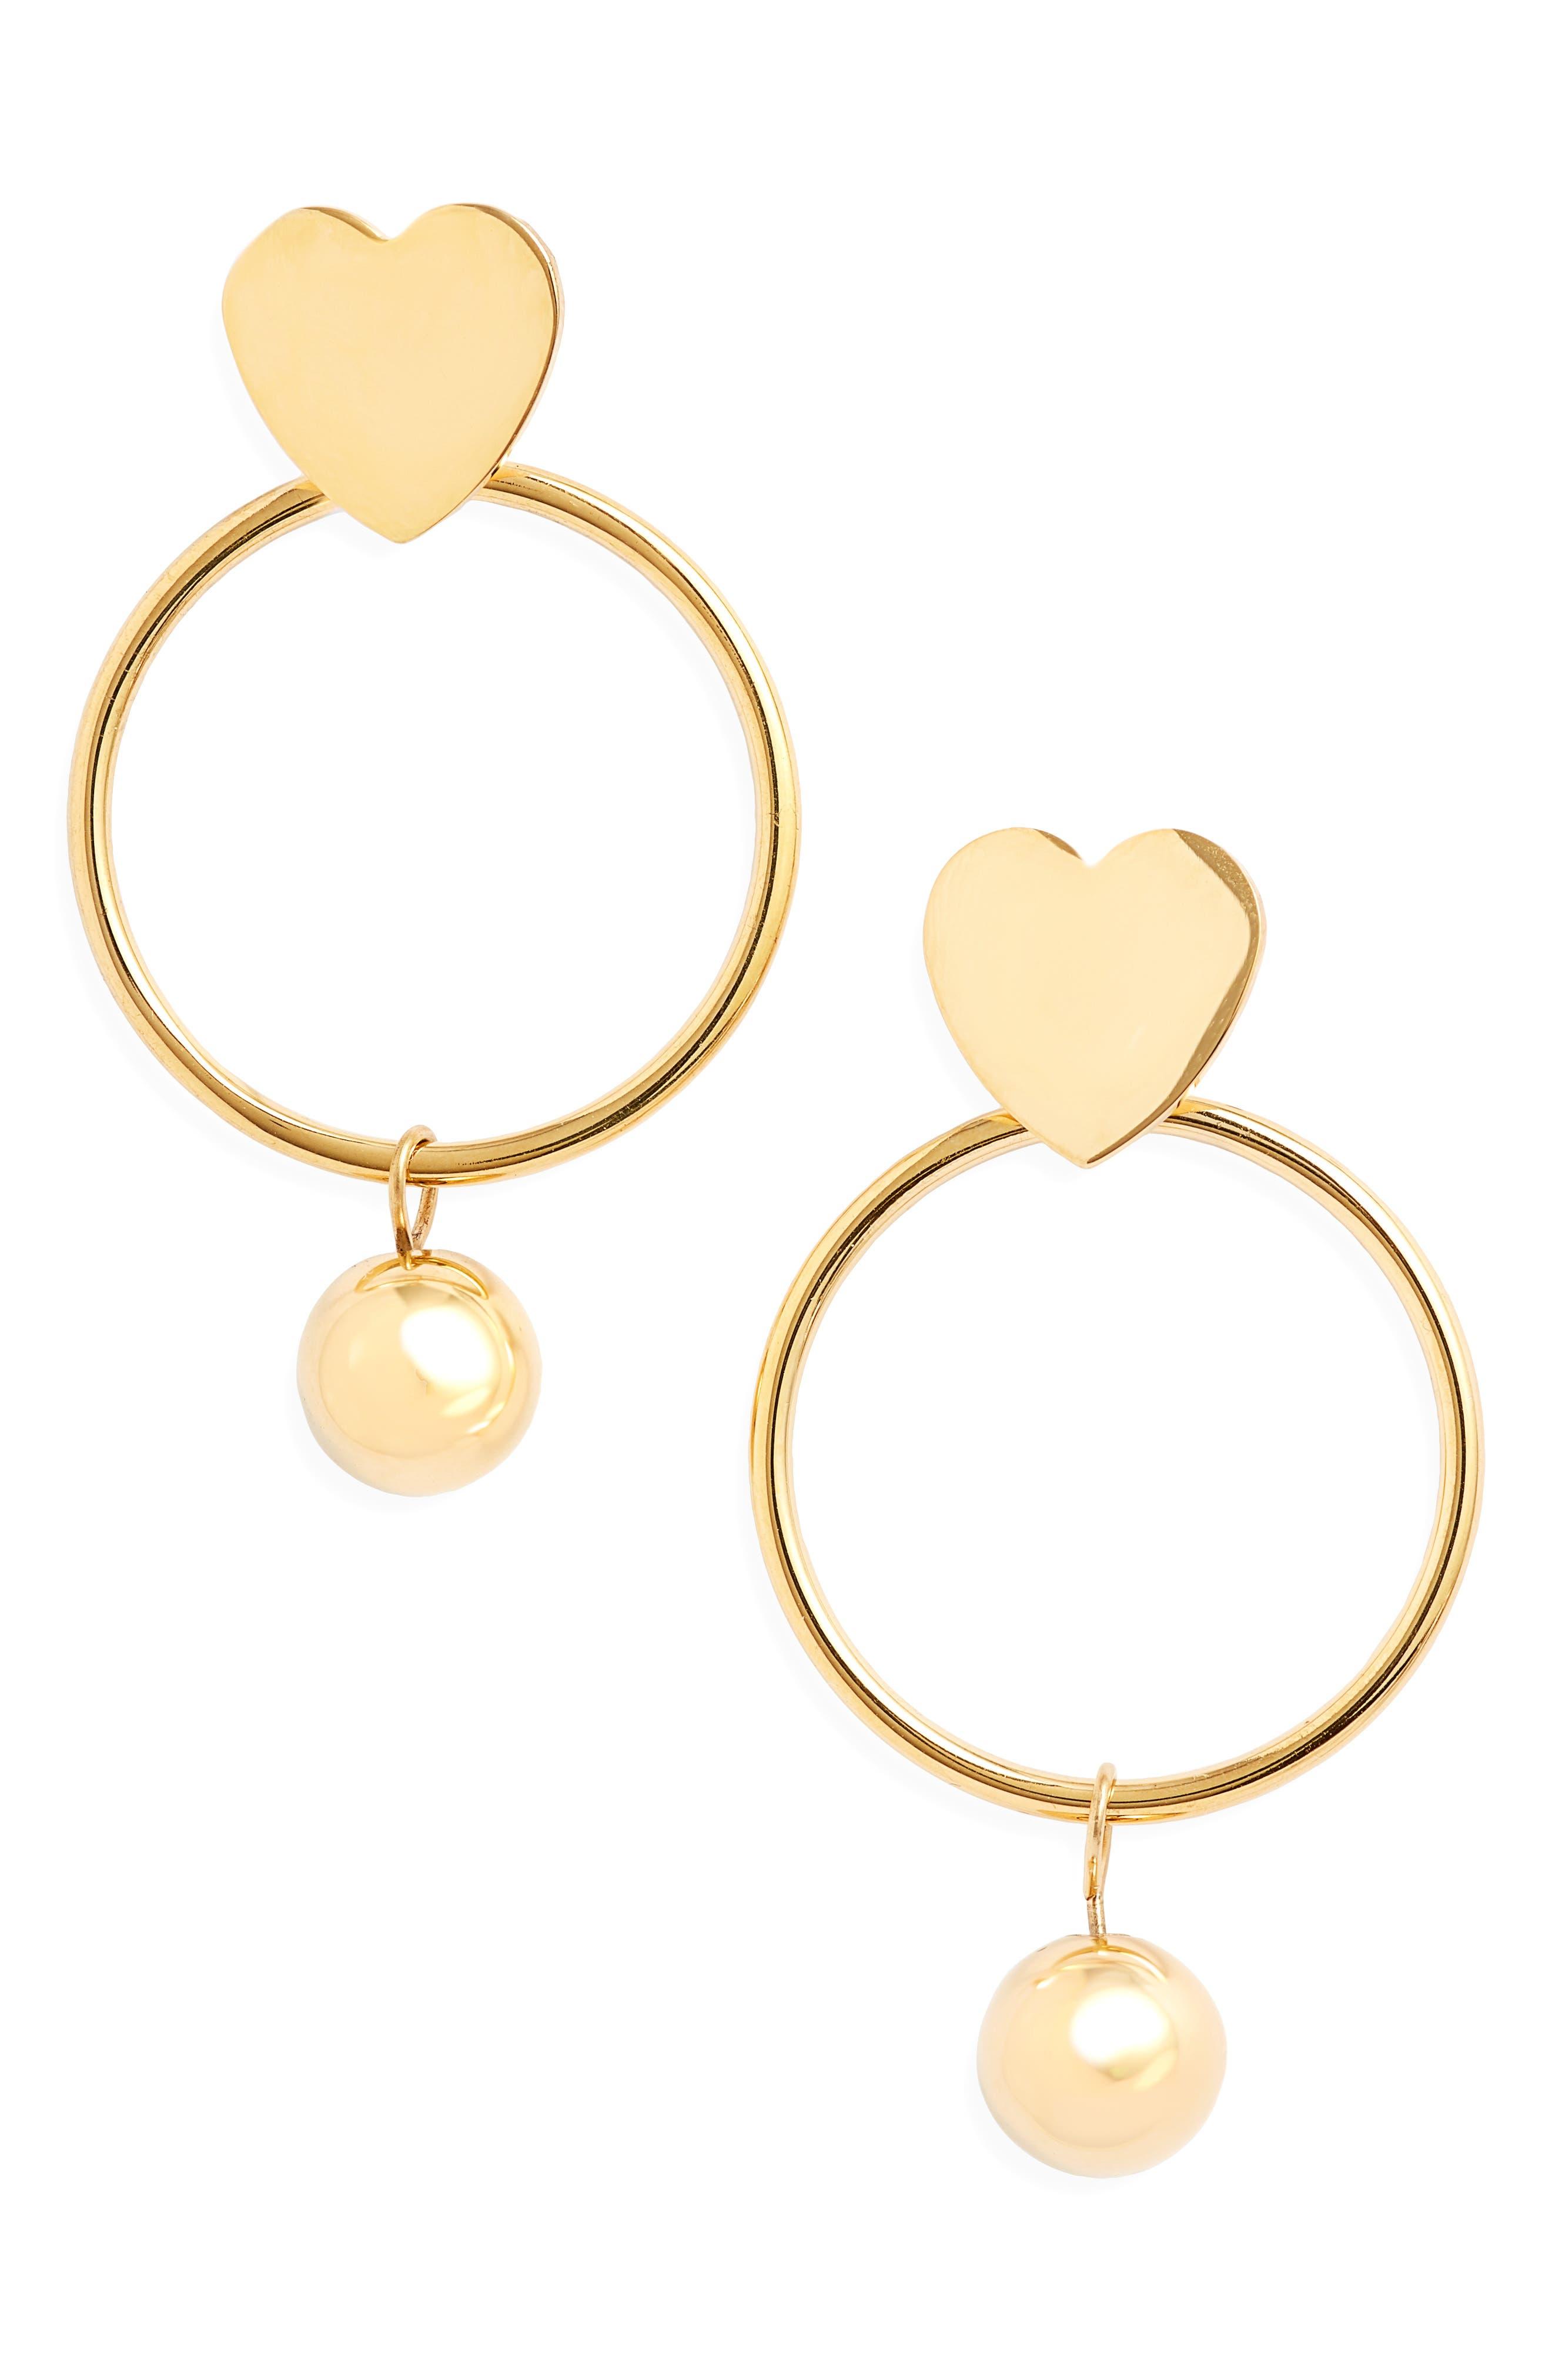 Heart Hoop Imitation Pearl Drop Earrings